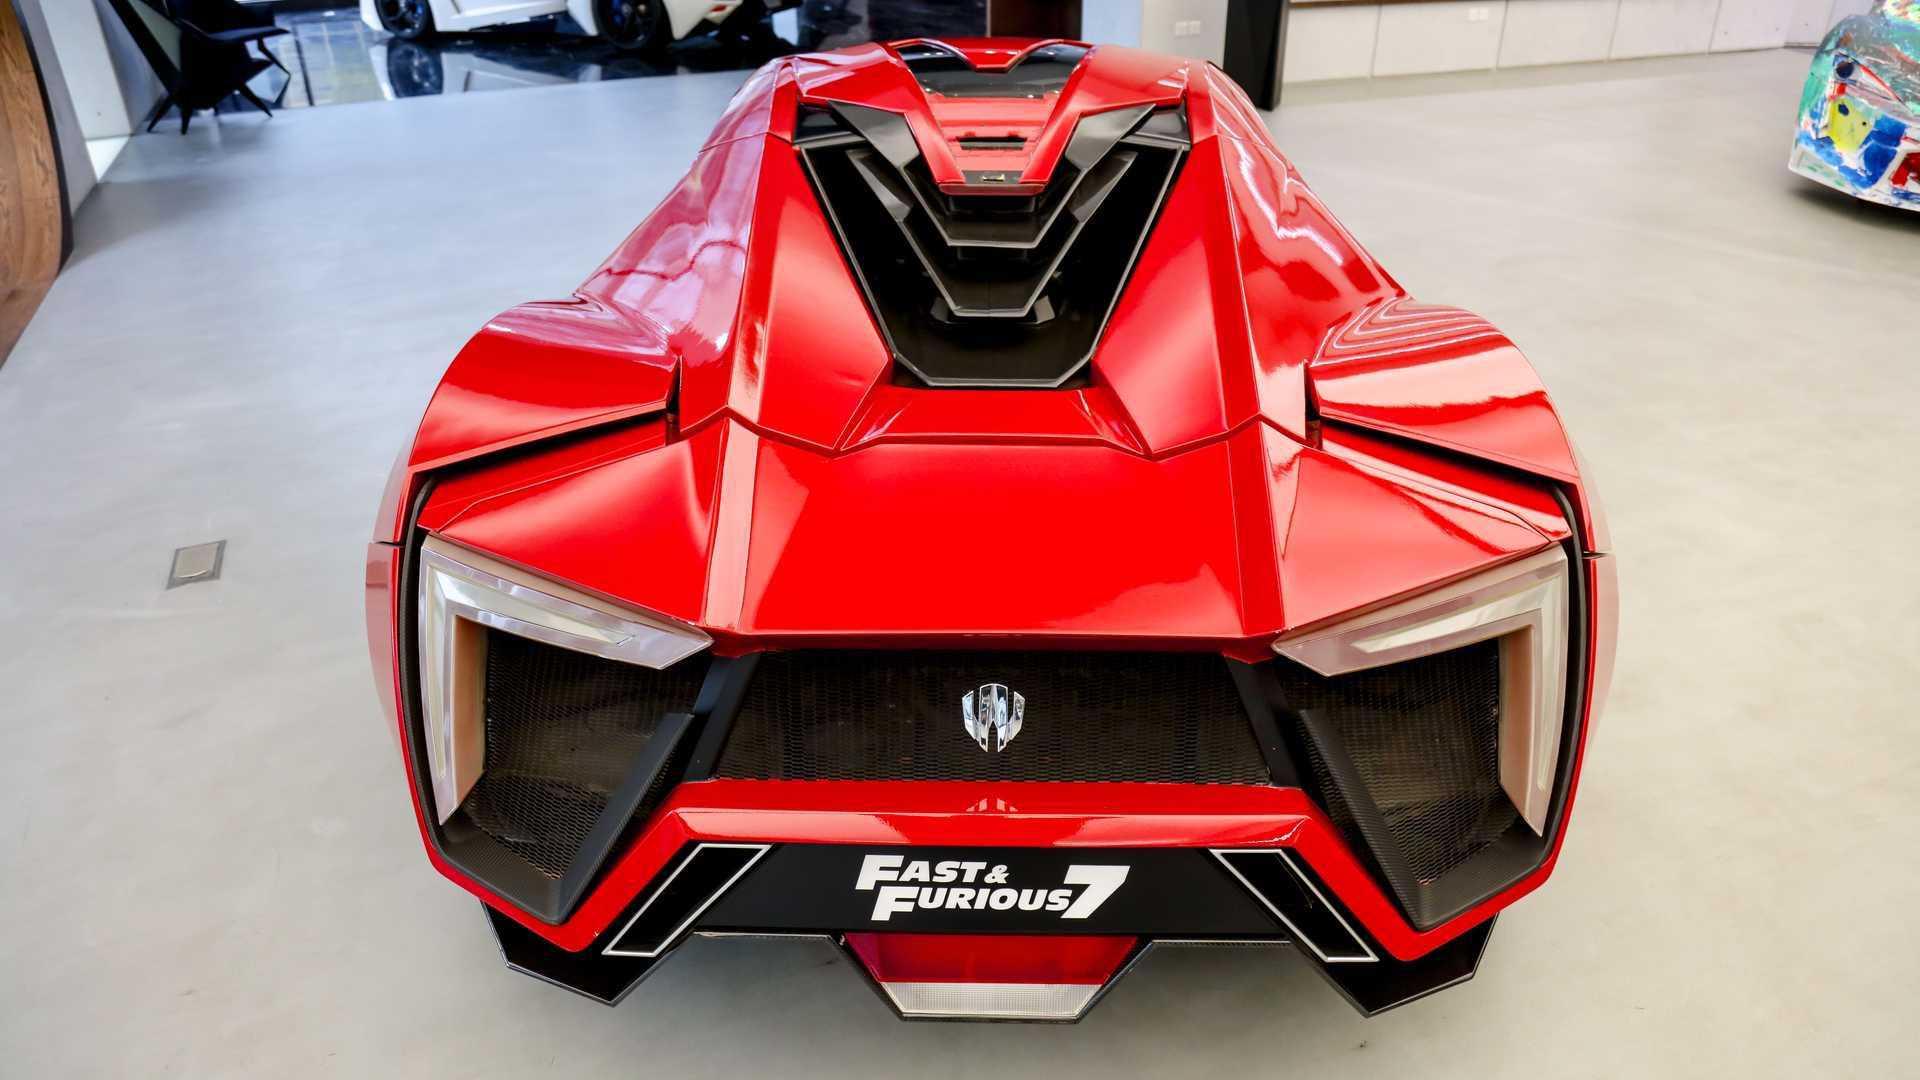 Lykan_HyperSport_stunt_car_sale-0011